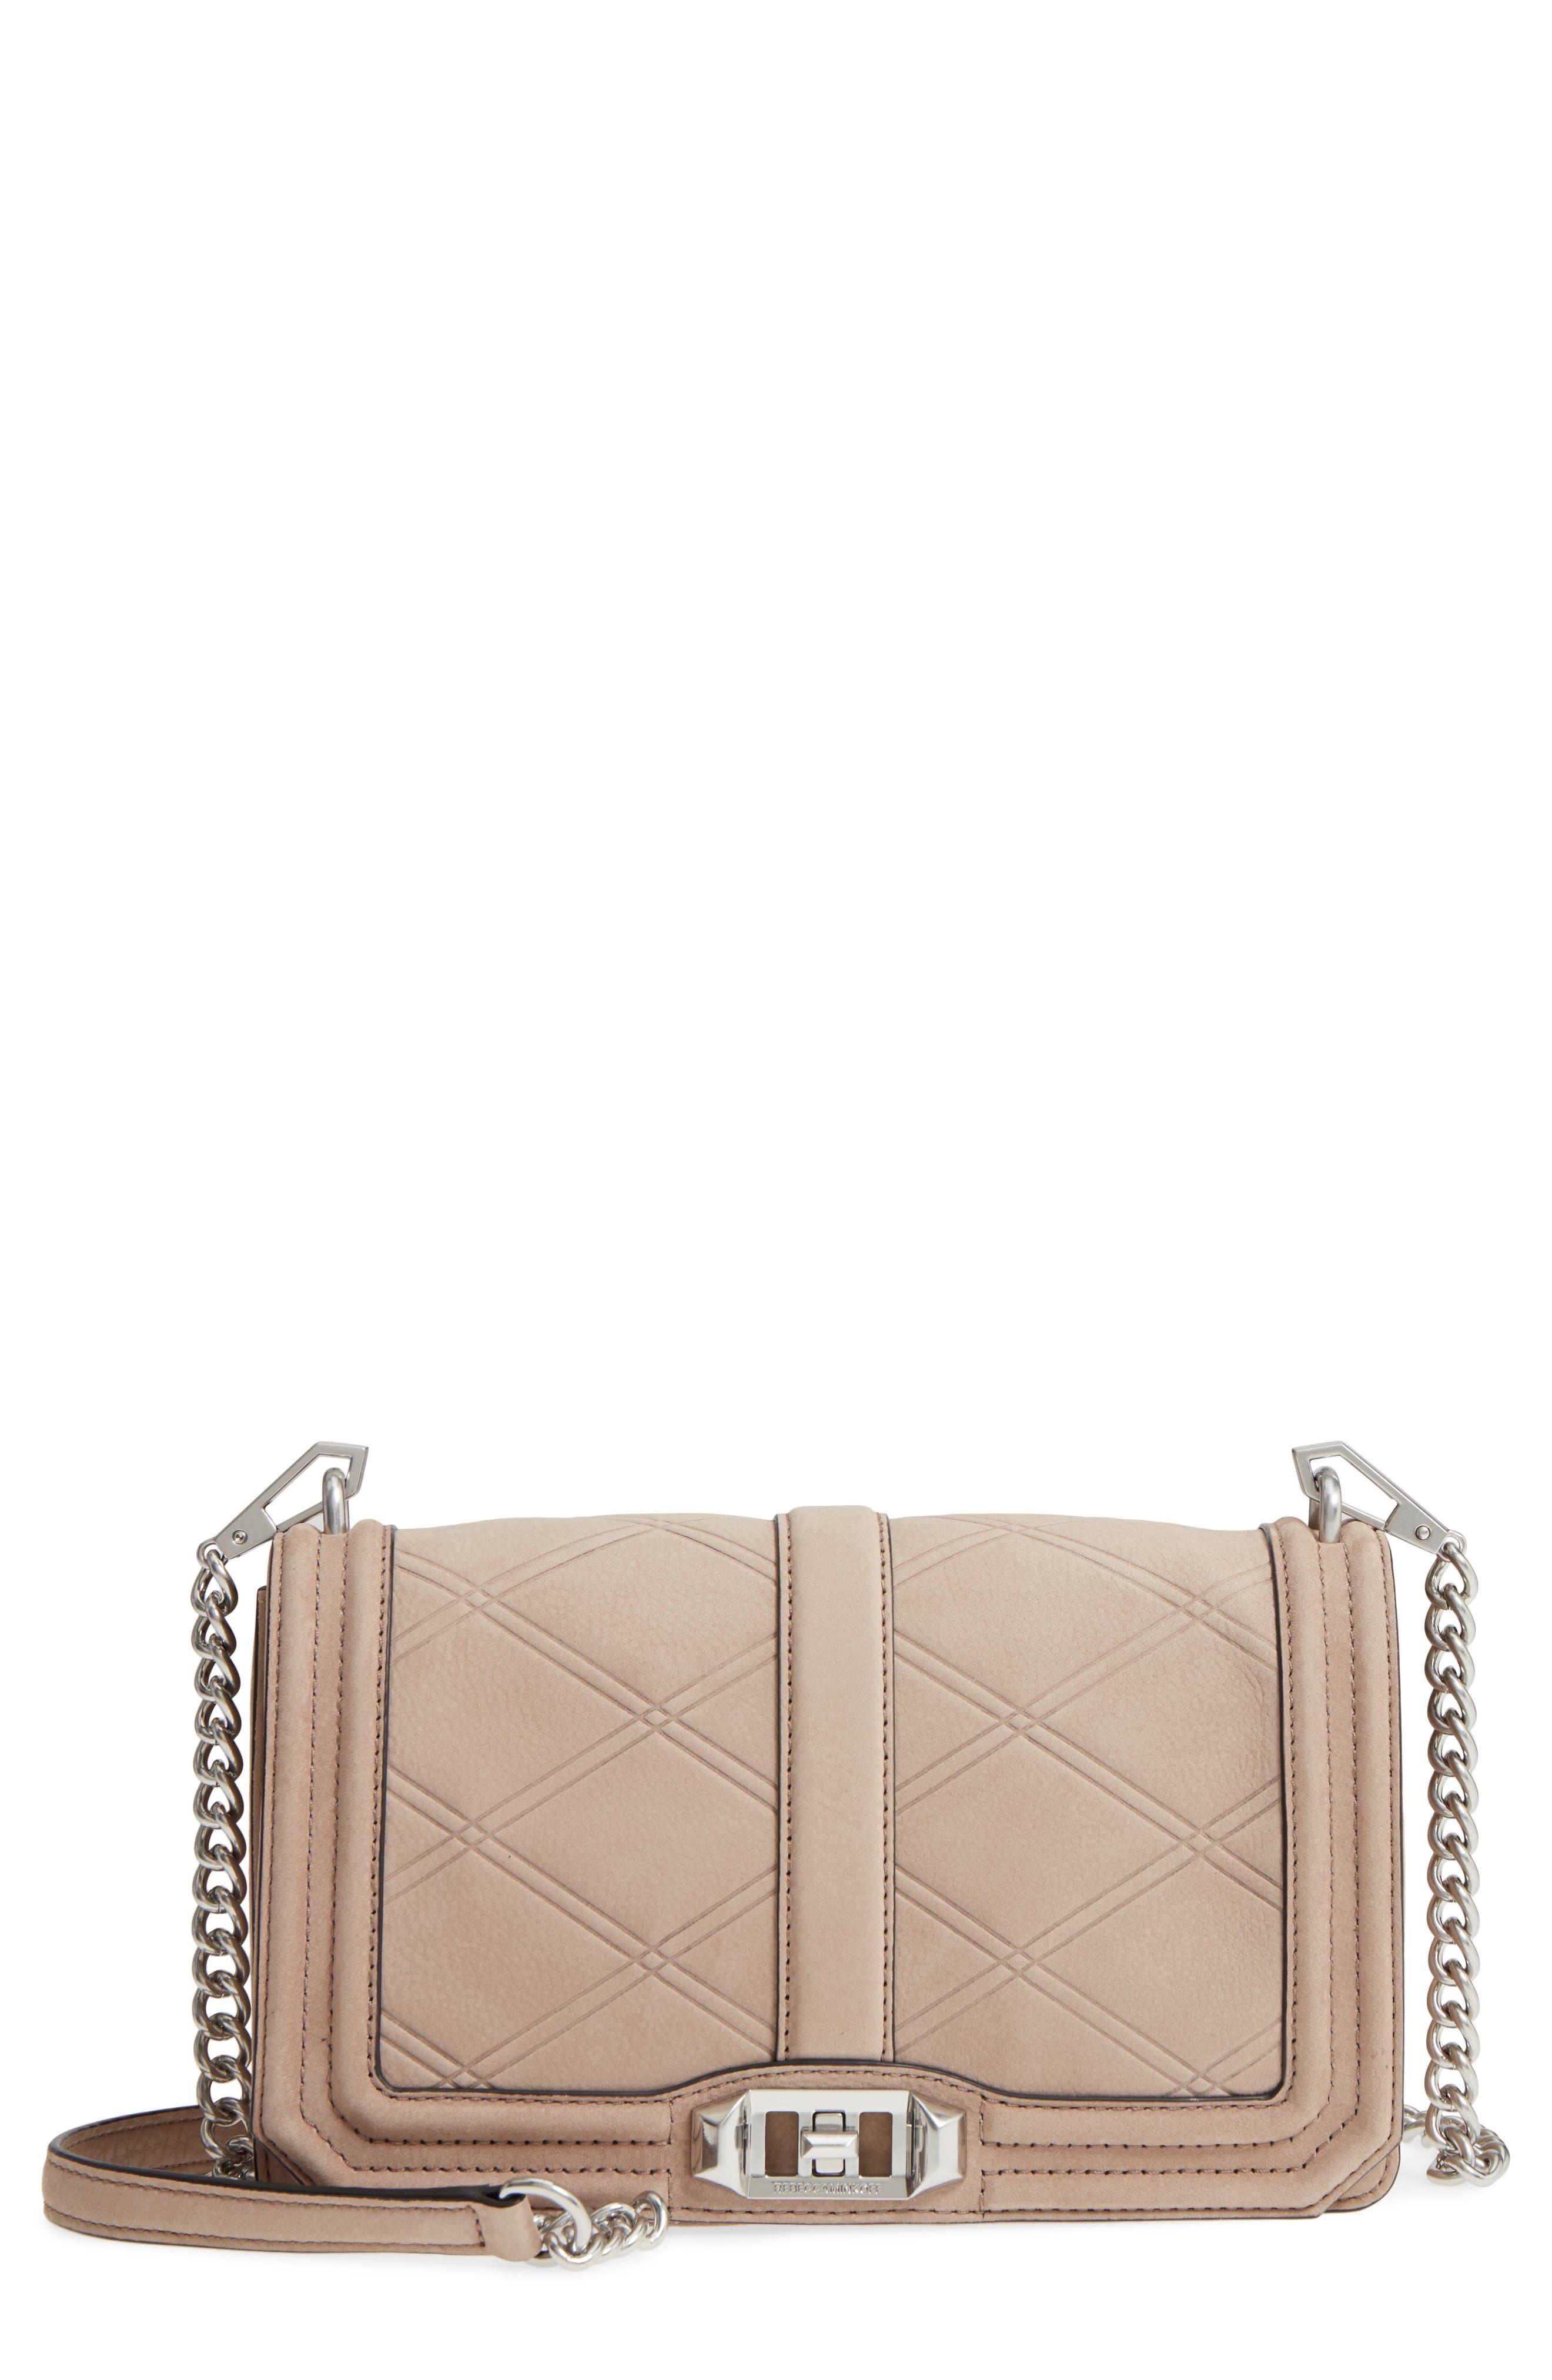 Rebecca Minkoff Love Tooled Leather Crossbody Bag